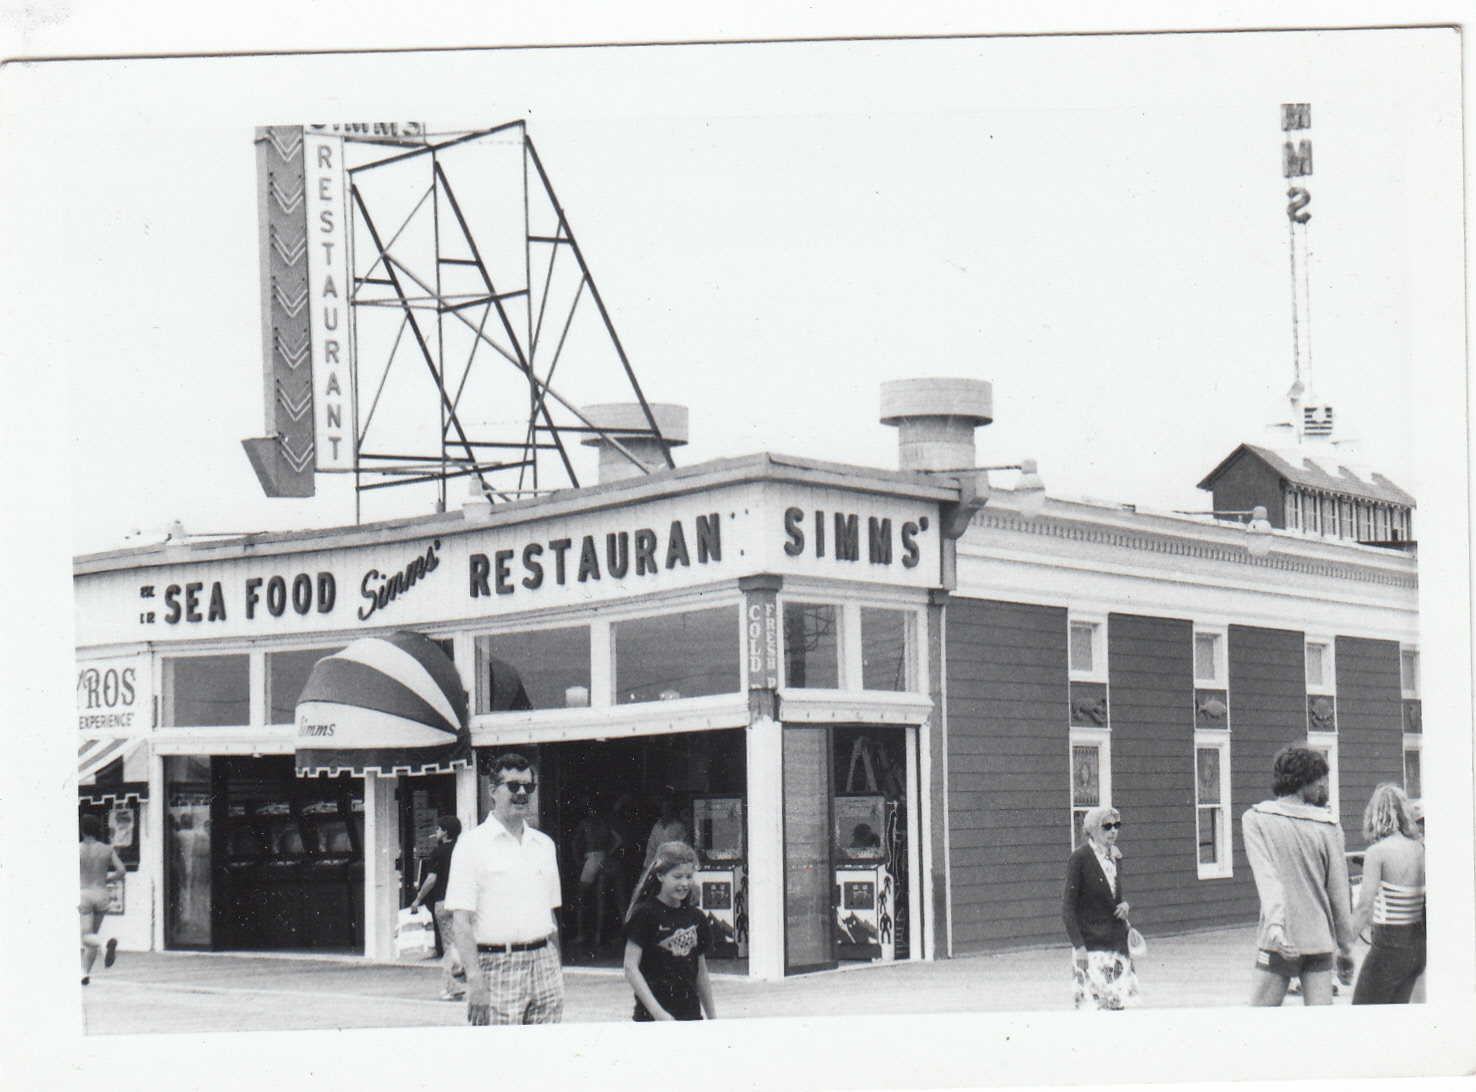 Ocean City Days Simms Restaurant 8th Street Boardwalk